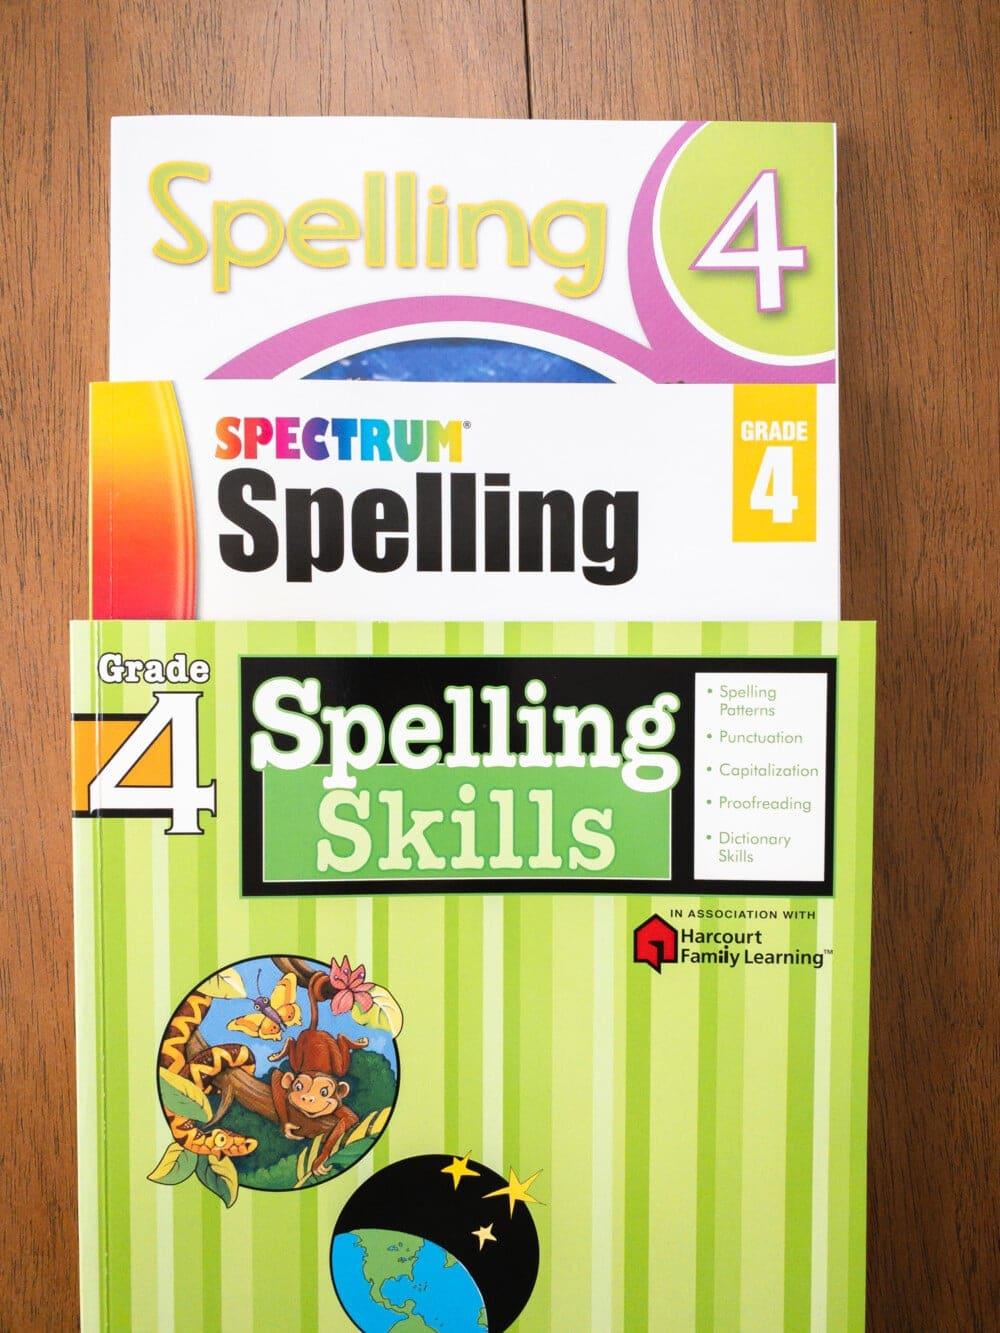 4th grade spelling workbooks sitting on a desk